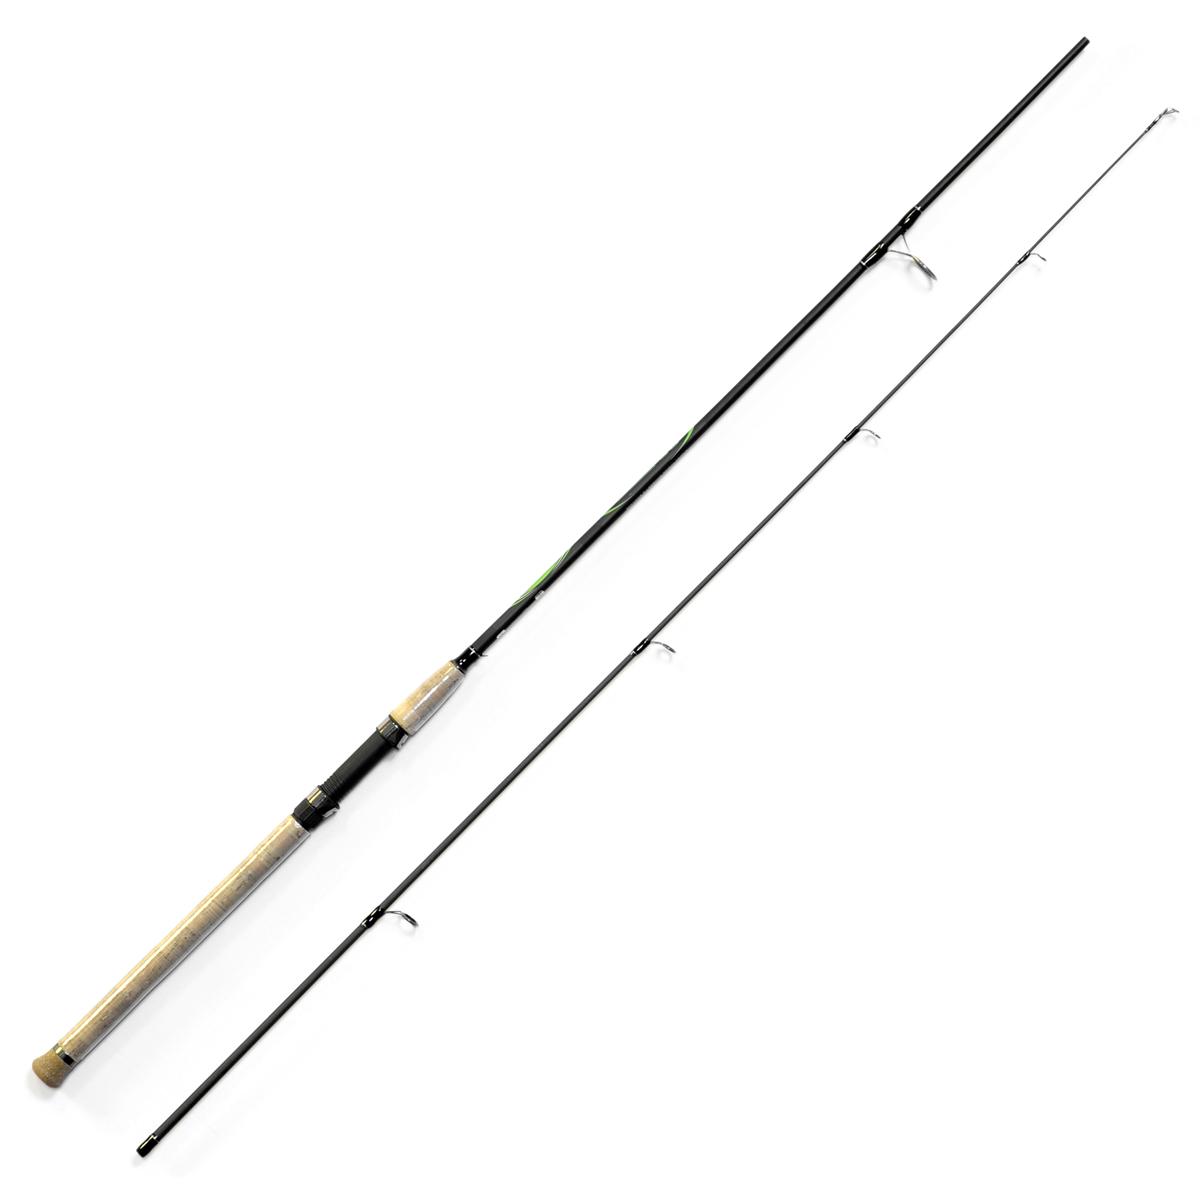 Спиннинг Salmo Sniper SPIN 30 2.40, длина 2,4 м, 10-30 г катушка безынерционная salmo diamond spin 6 20fd